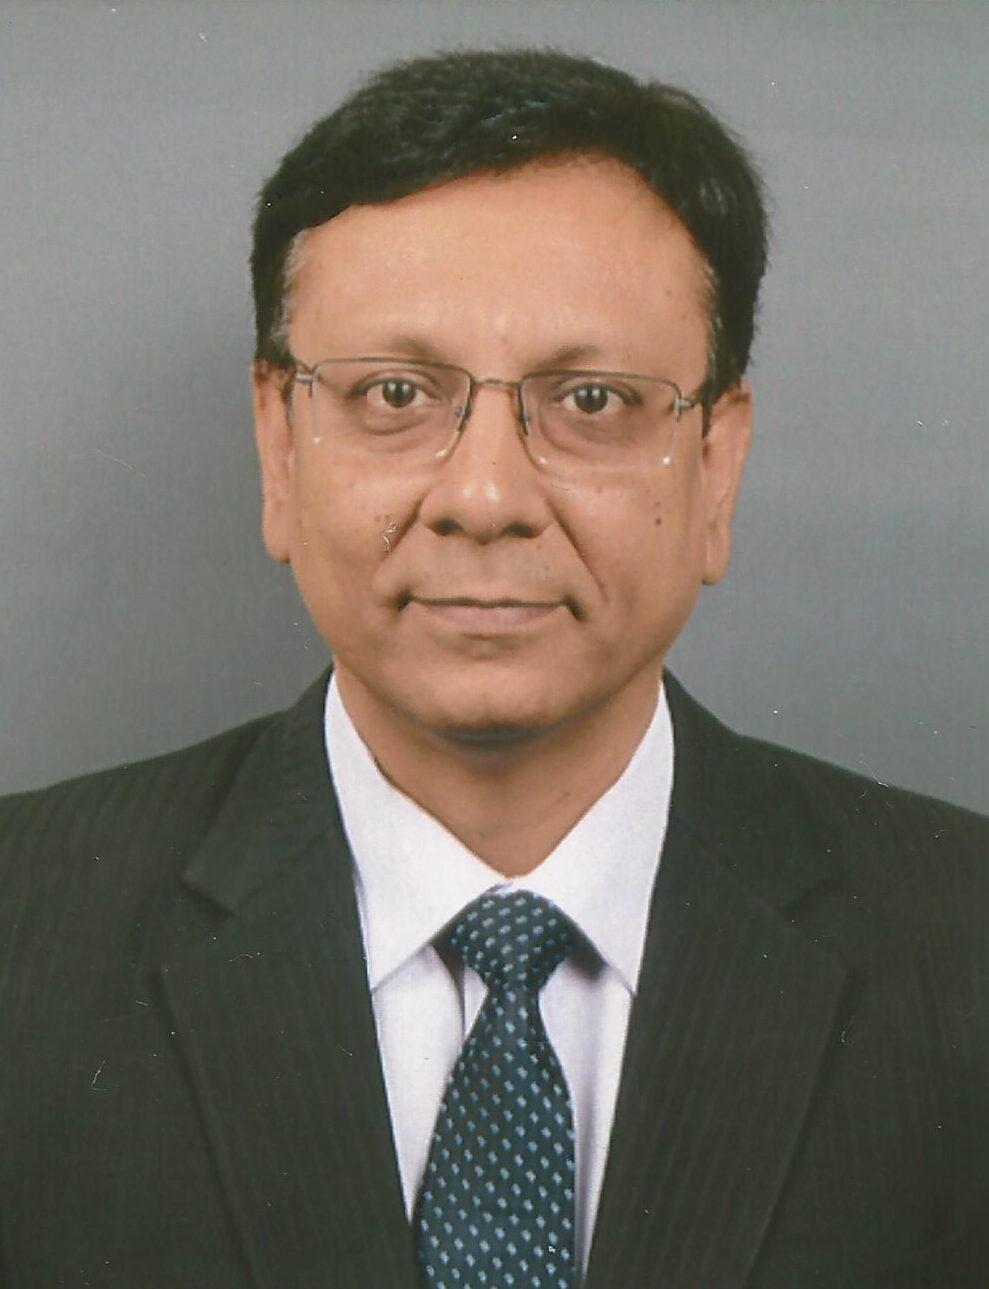 Prateek Kishore